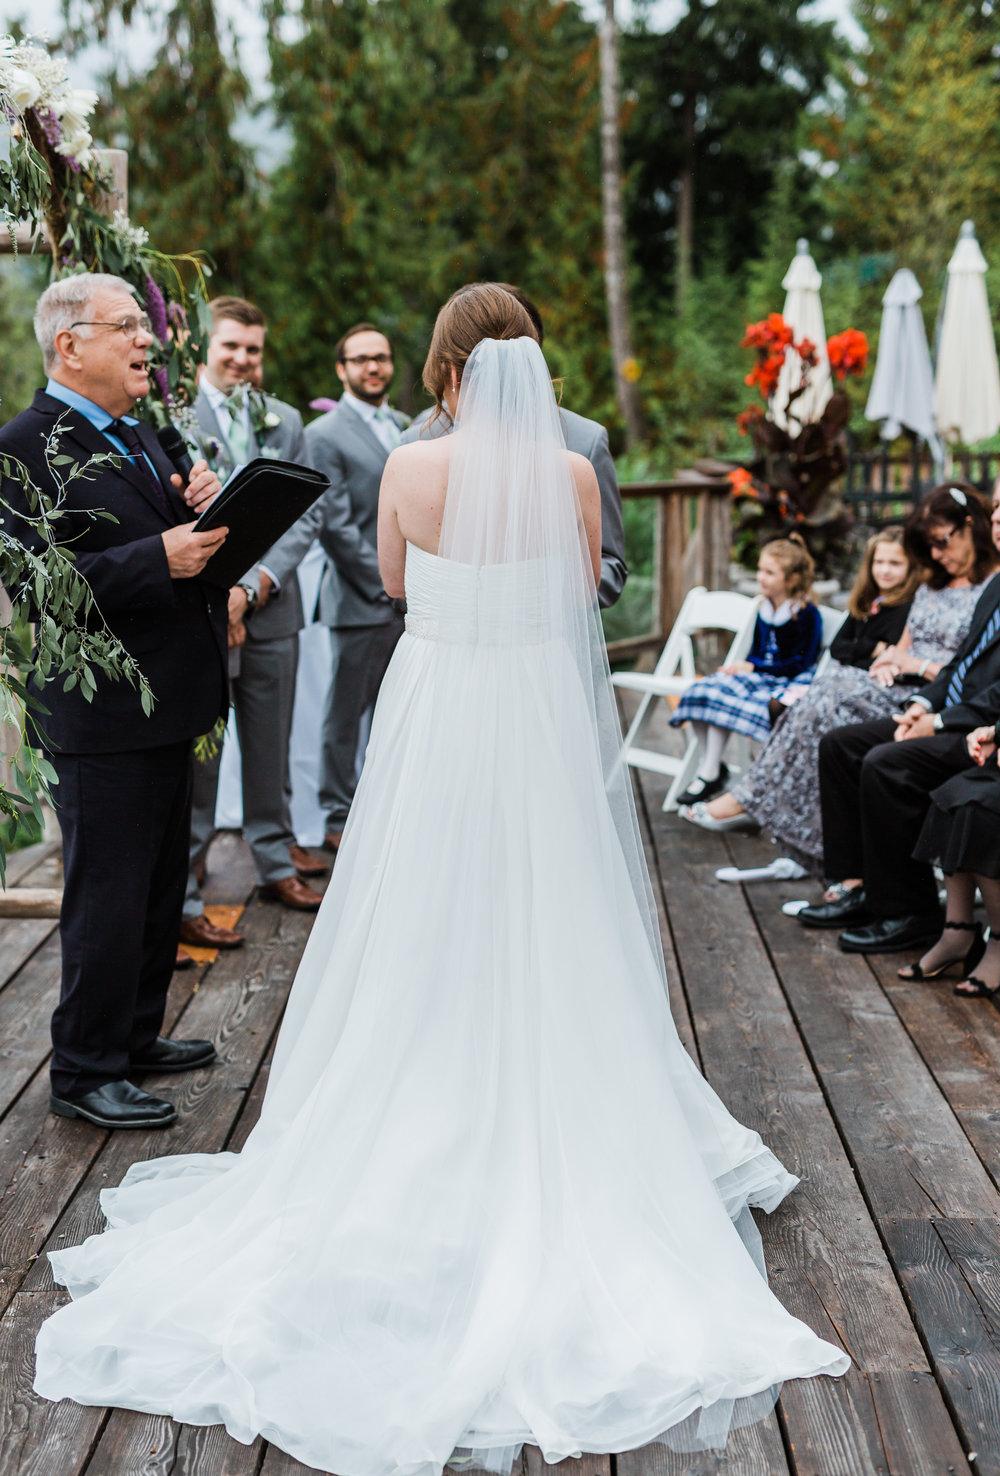 West Coast Wilderness Lodge Wedding Photos - Vancouver Wedding Photographer & Videographer - Sunshine Coast Wedding Photos - Sunshine Coast Wedding Photographer - Jennifer Picard Photography - IMG_4665.jpg